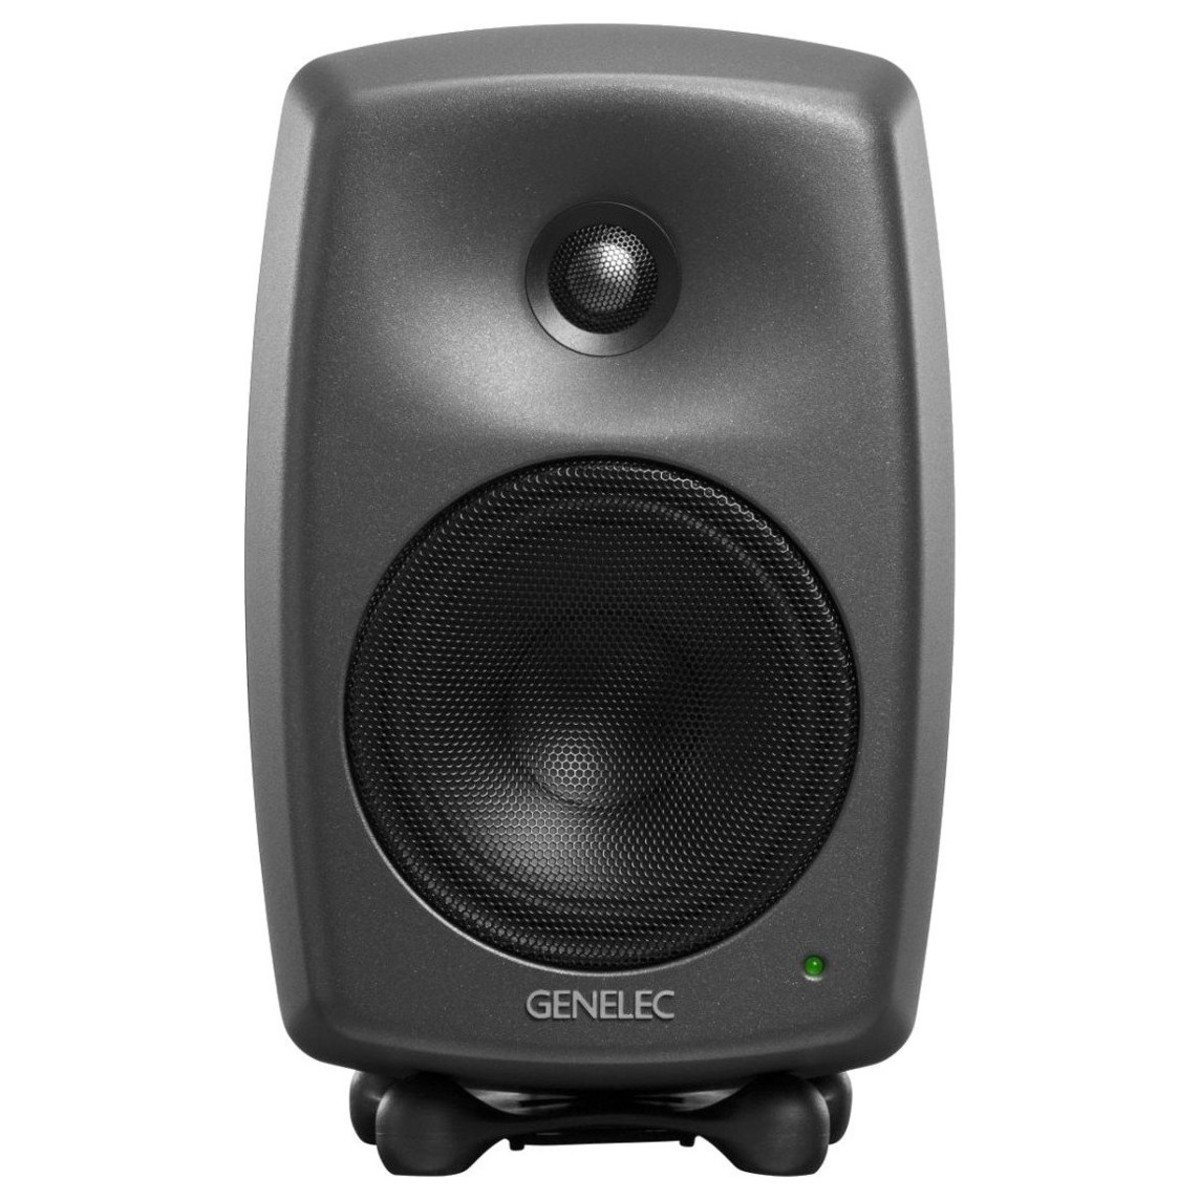 genelec 8030cpm active studio monitor single at gear4music. Black Bedroom Furniture Sets. Home Design Ideas